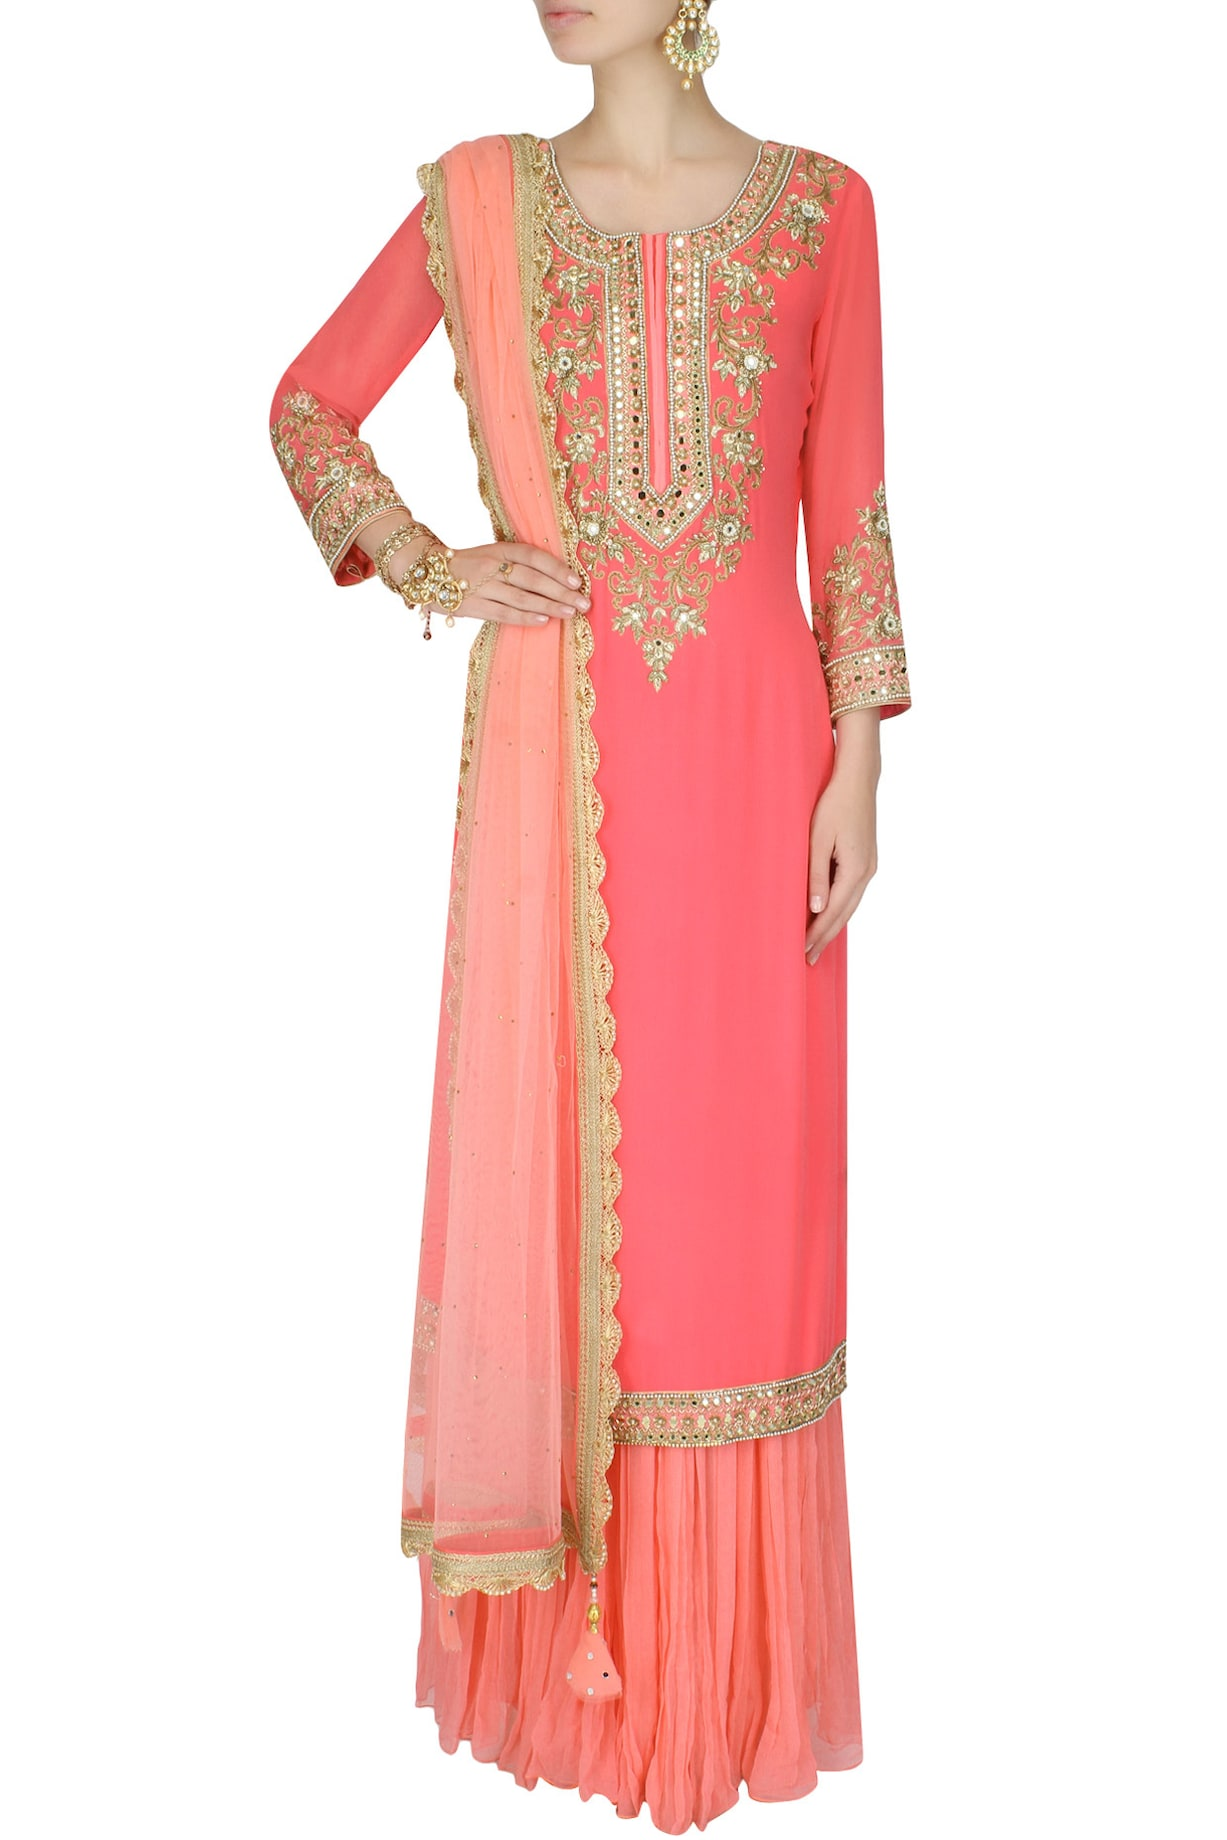 Sanna Mehan Sharara Sets